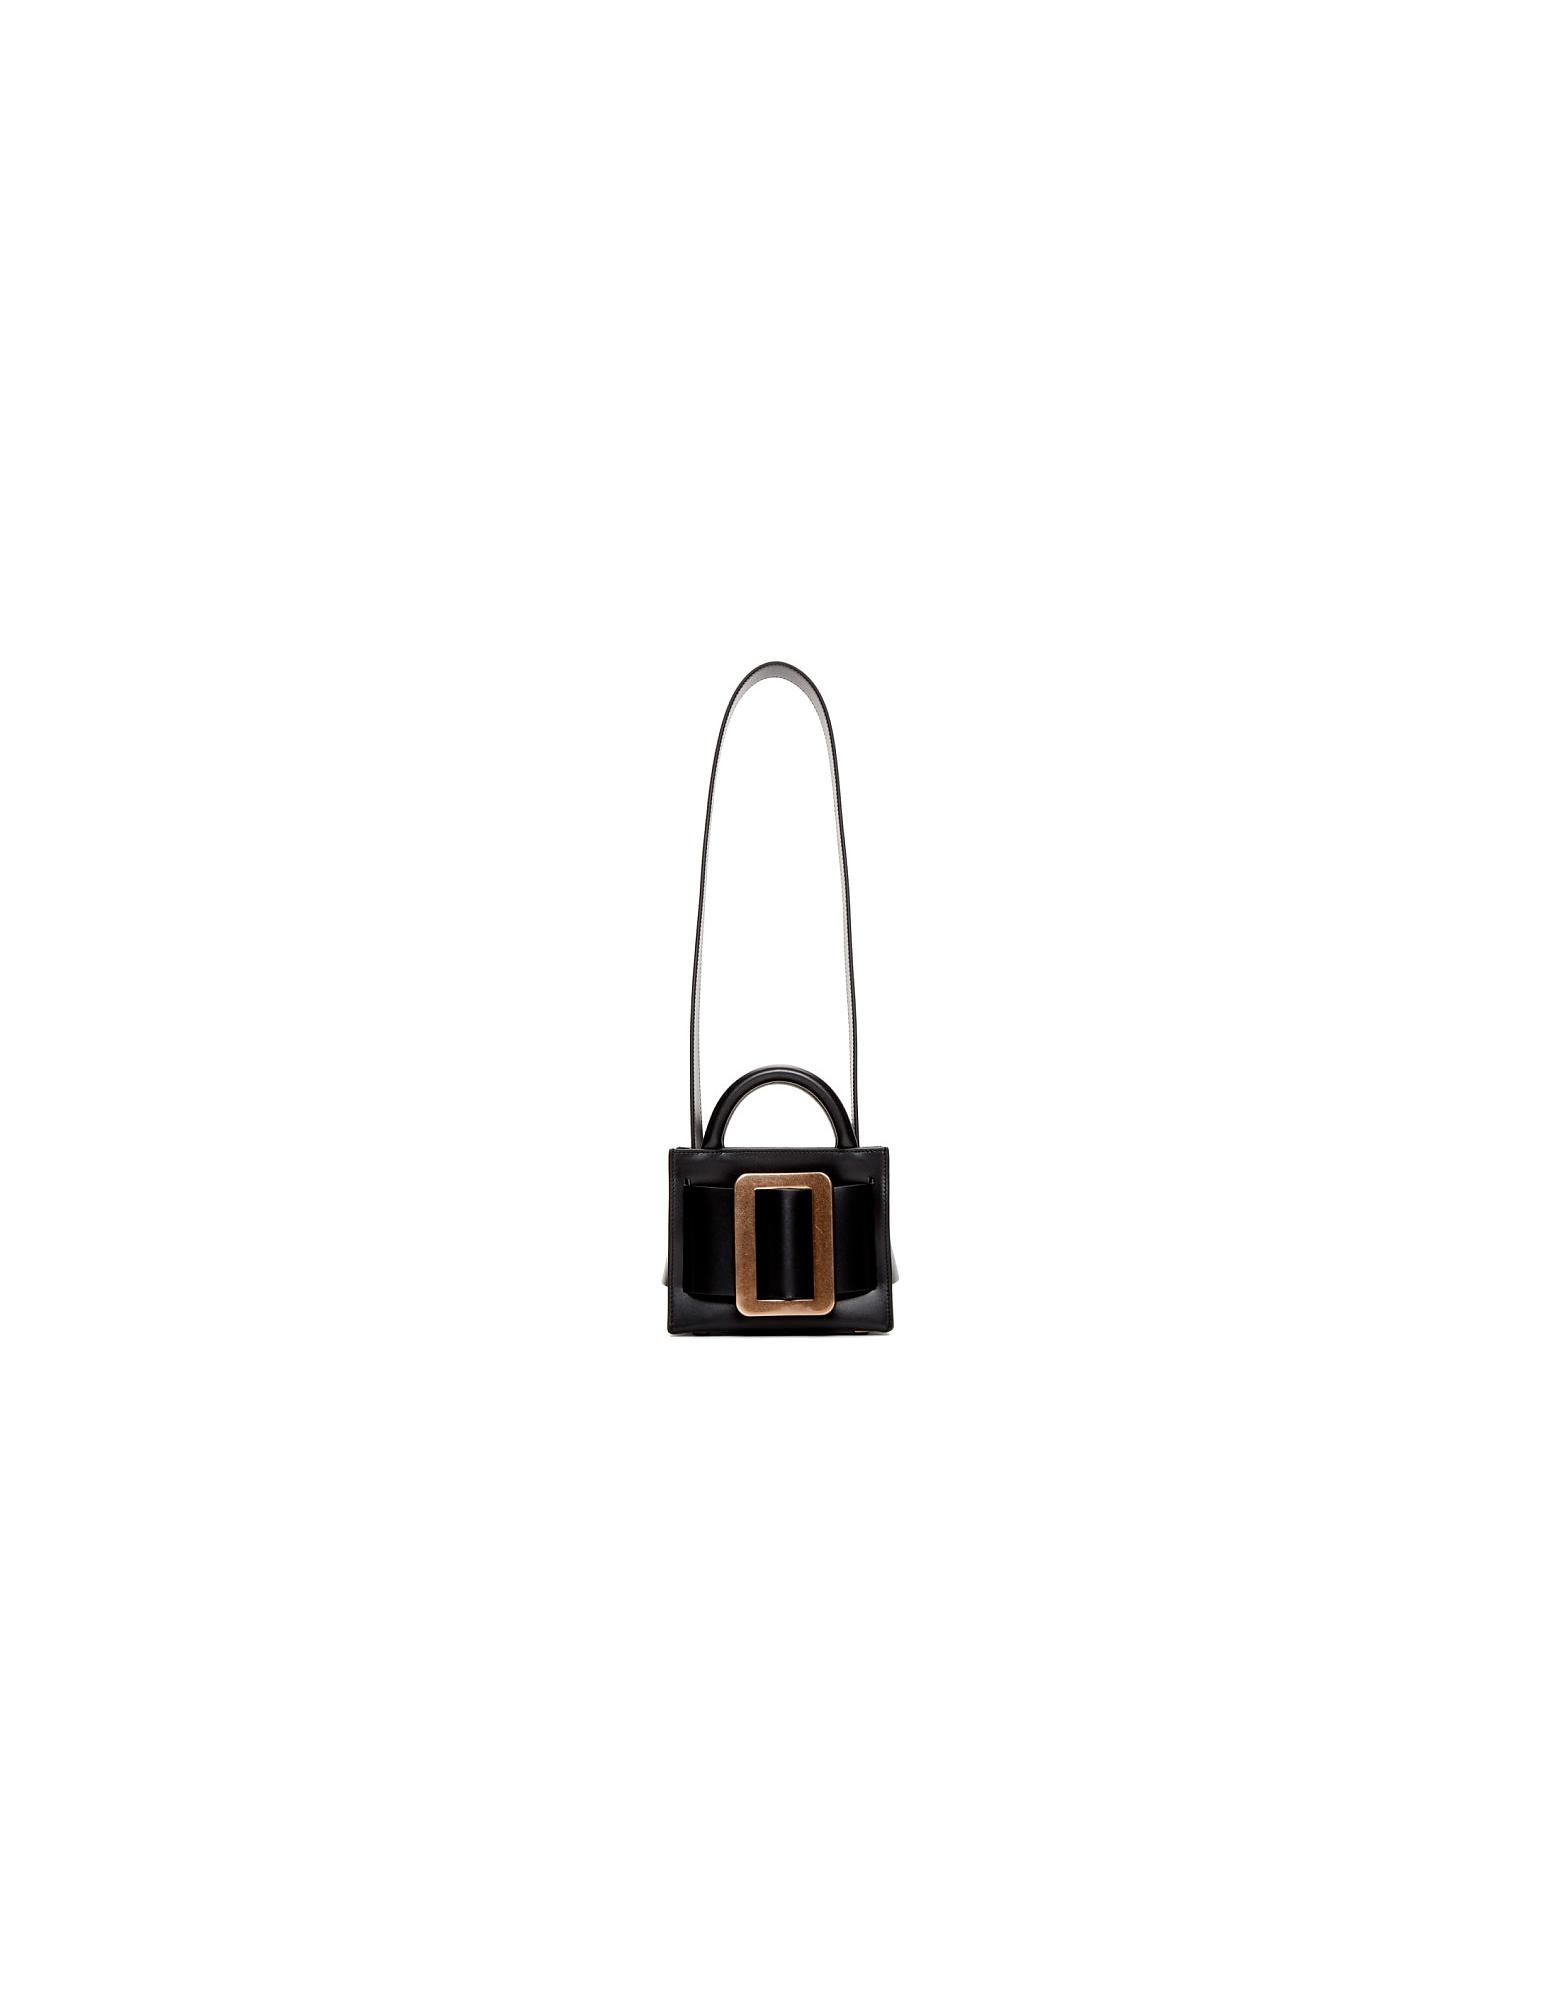 BOYY Designer Handbags, Black Bobby 16 Shoulder Bag